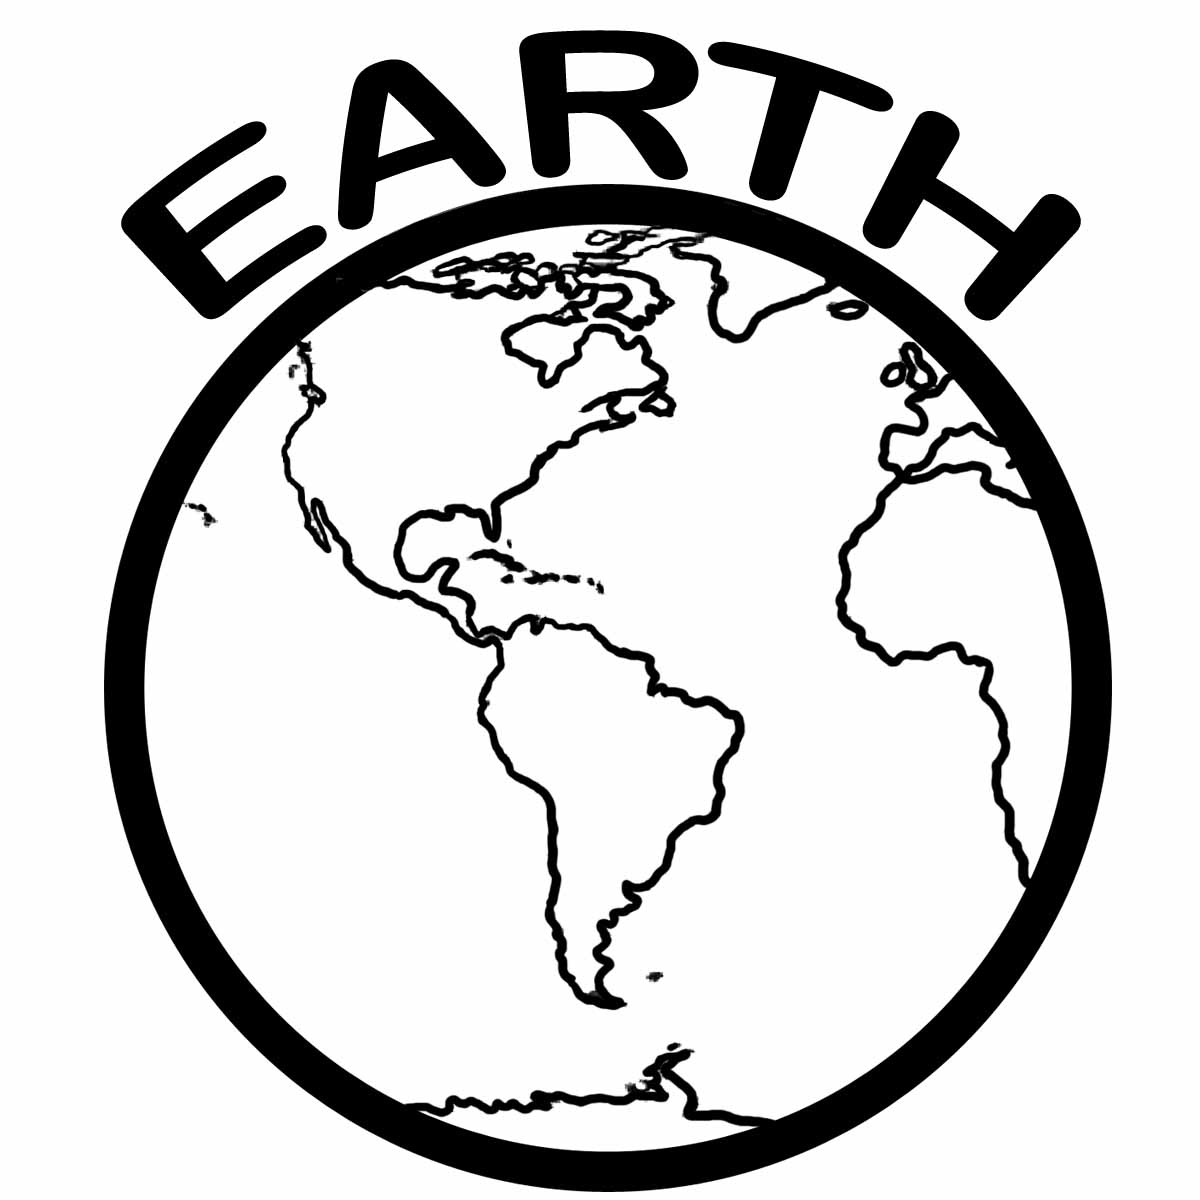 Earth Clip Art Black And White Clipart Panda